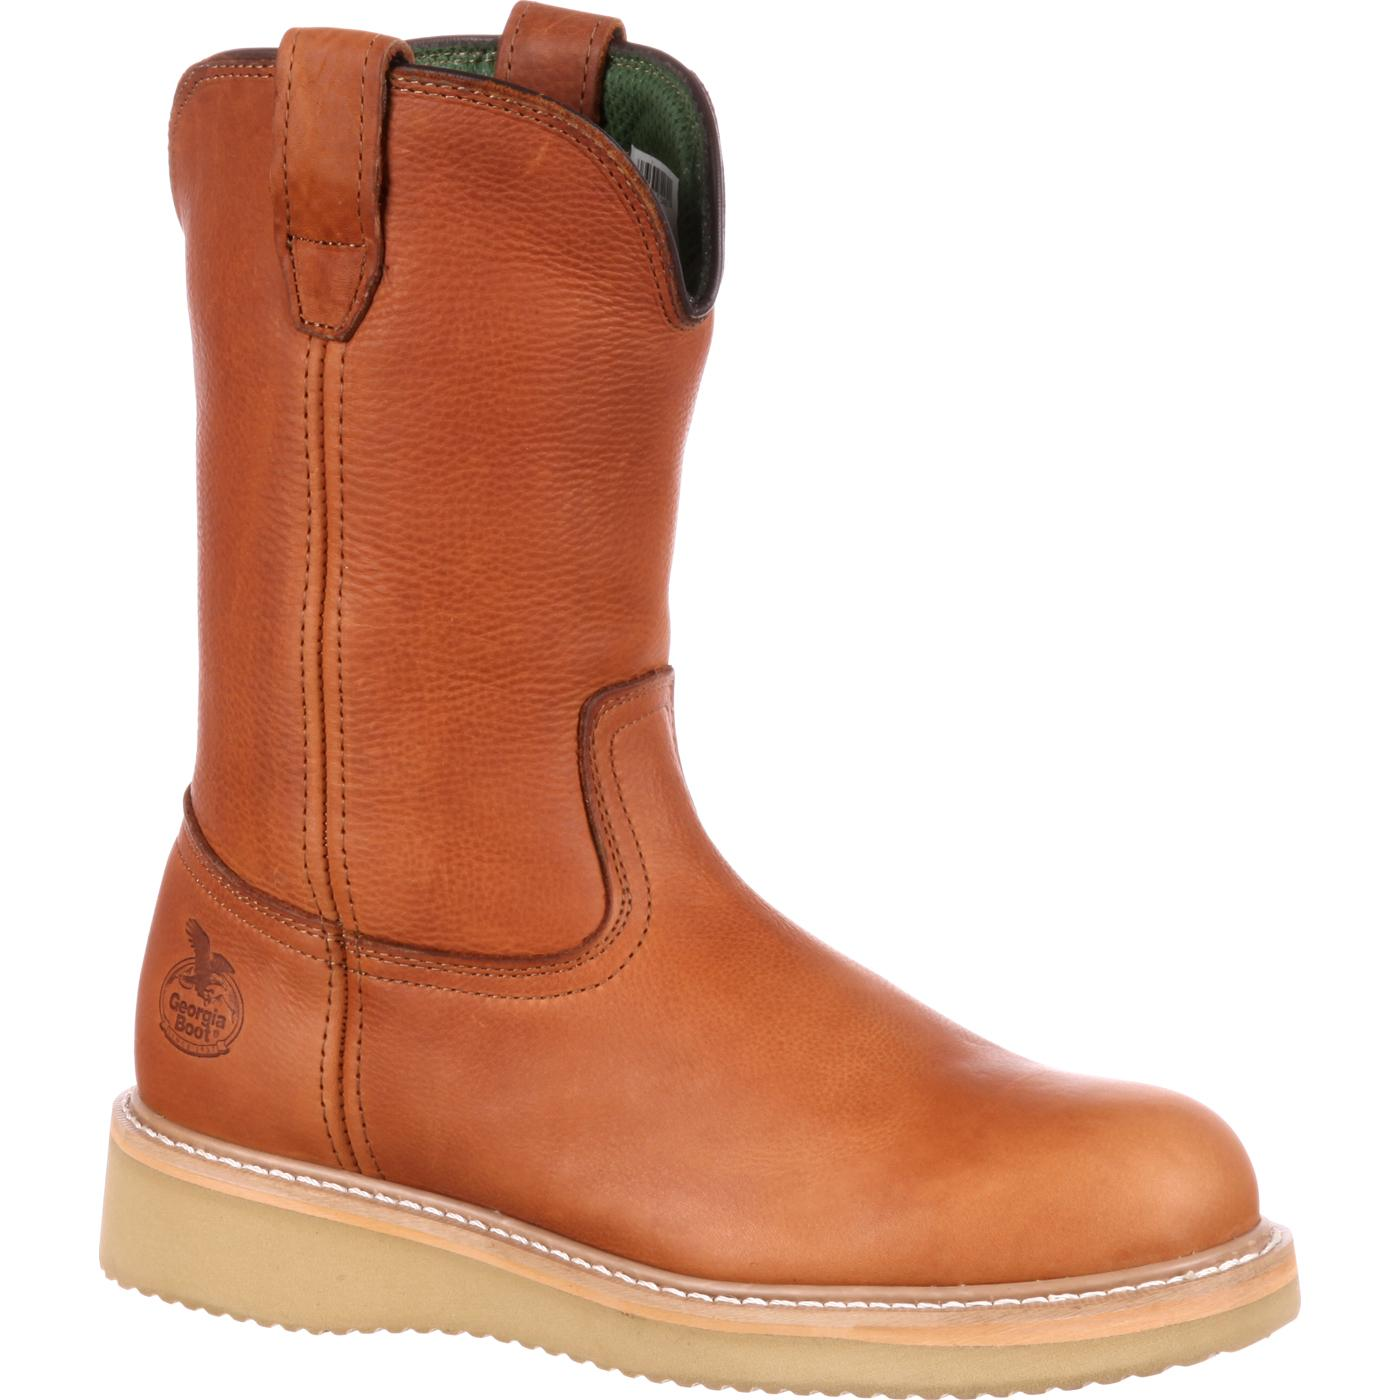 wellington boots georgia boot wedge steel toe wellington work boot VHDVSVN